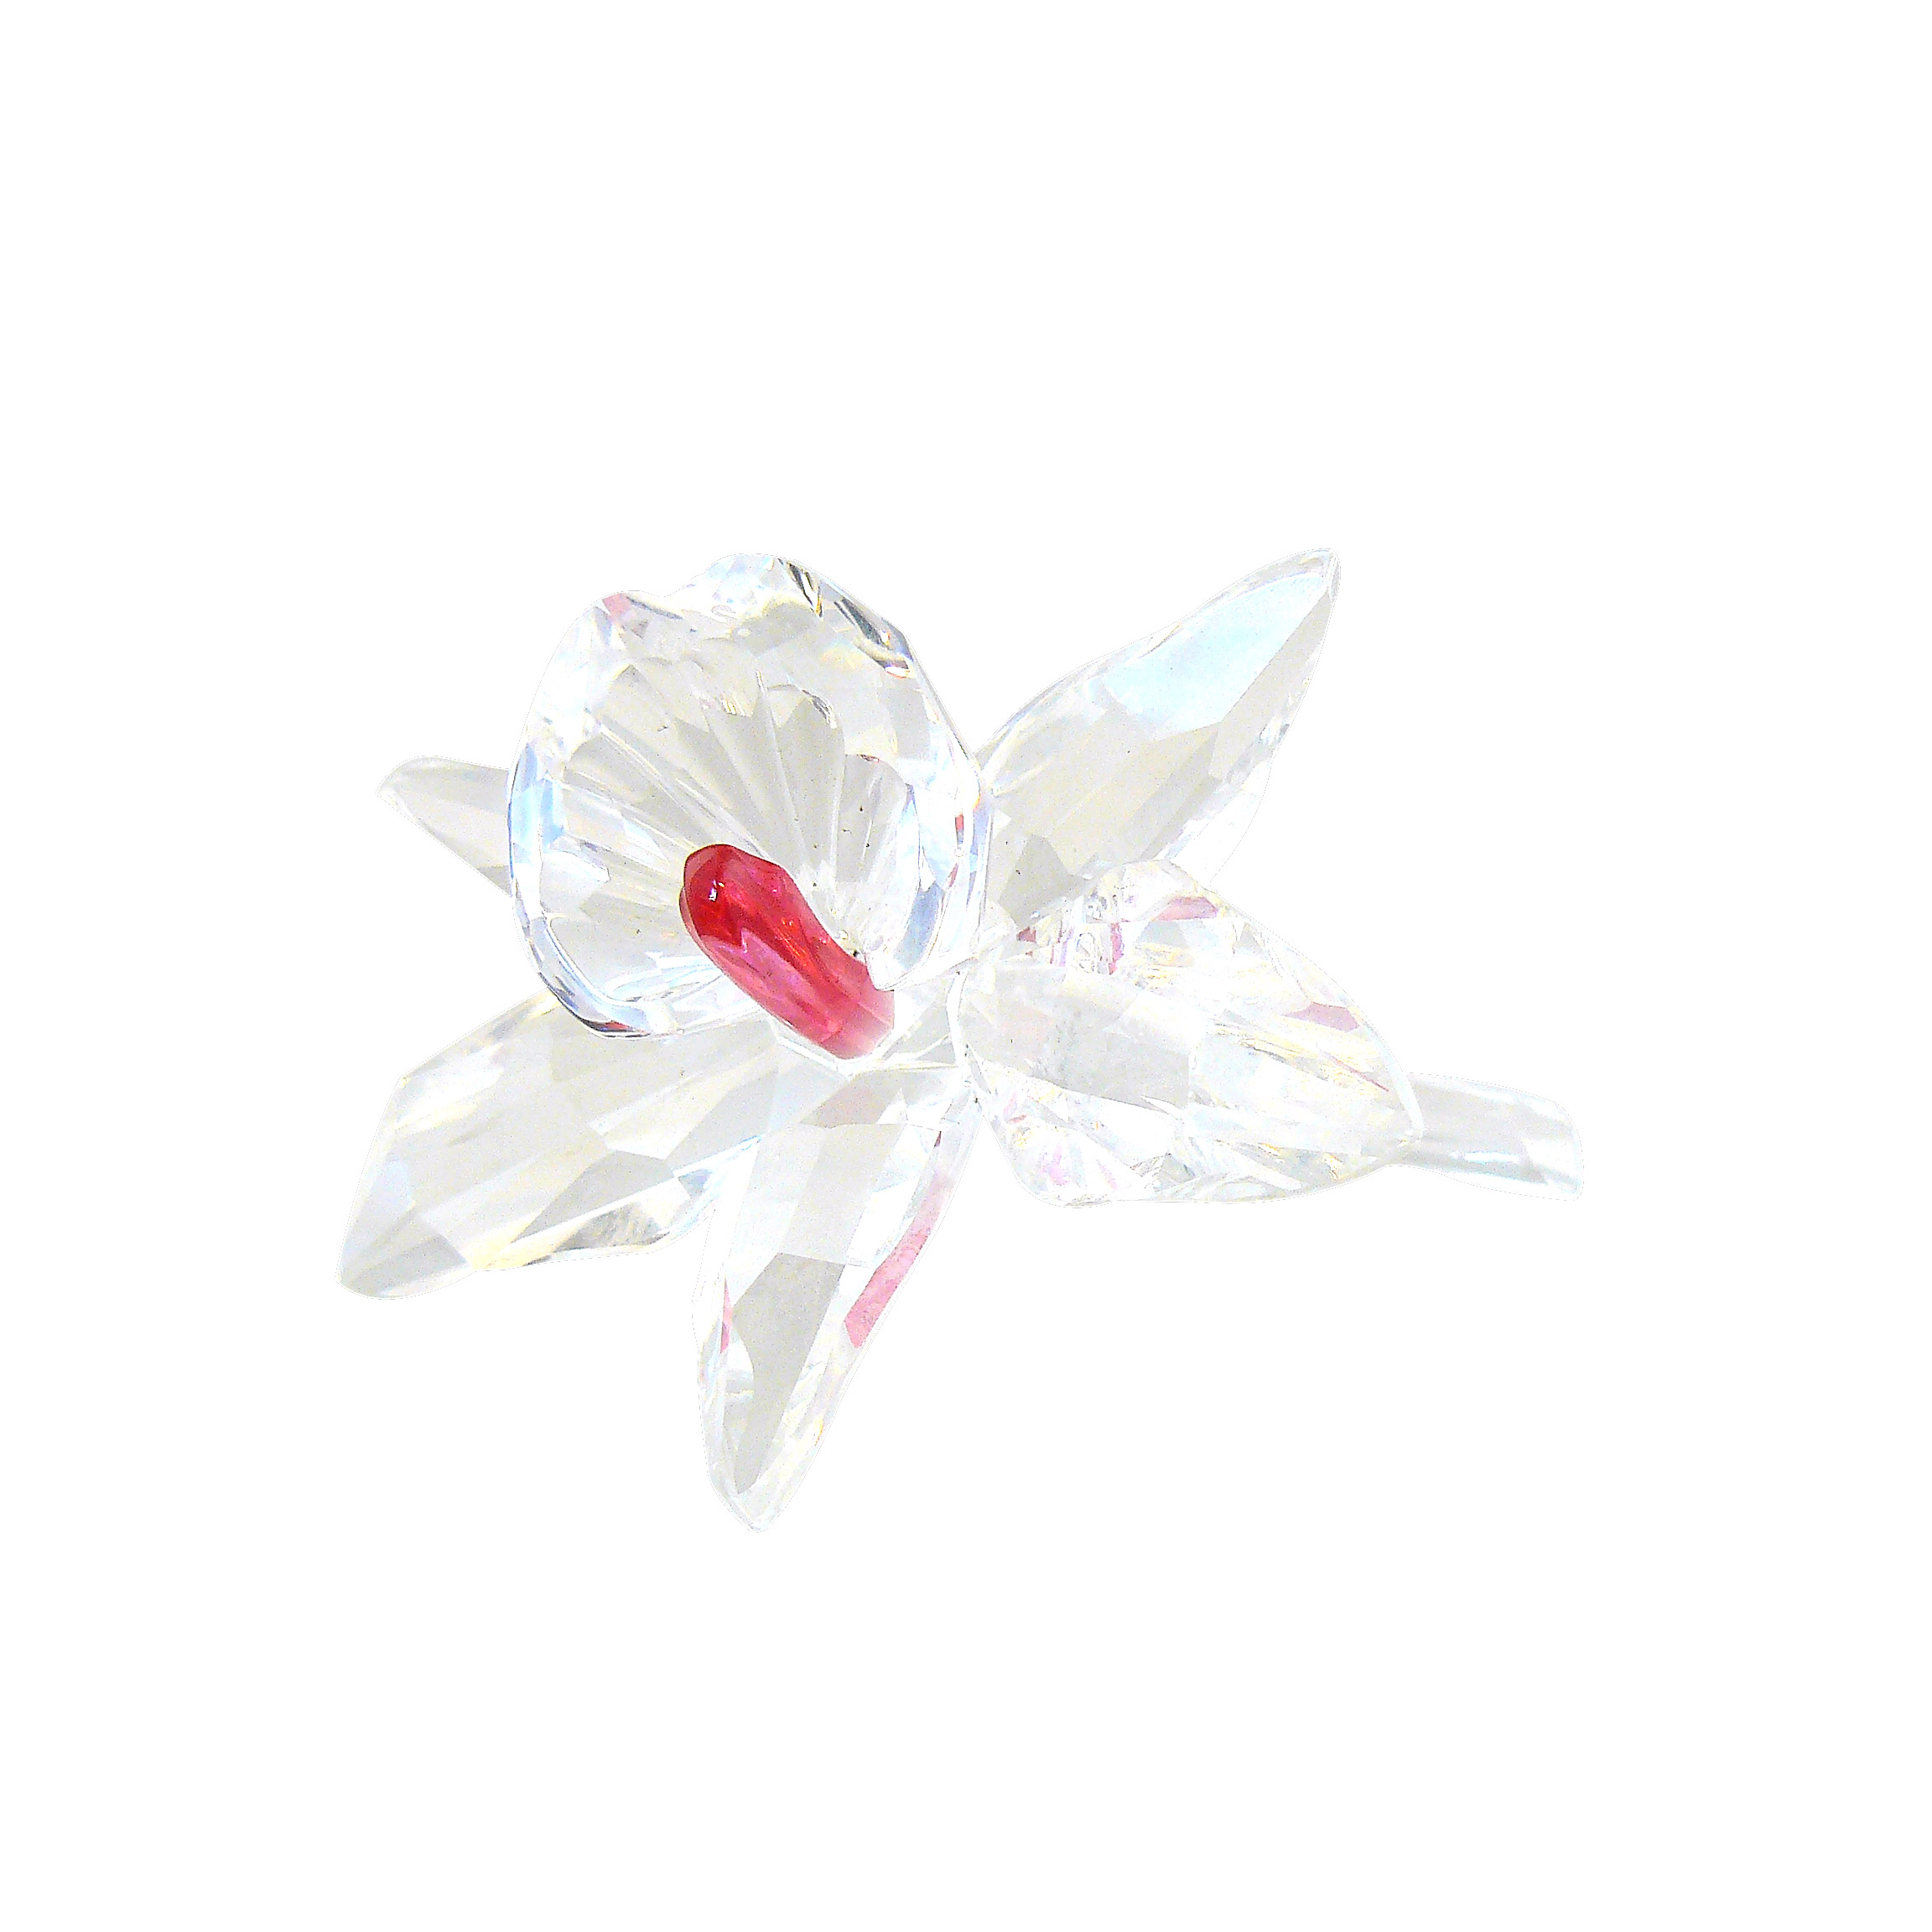 Swarovski Crystal Διακοσμητικό Λουλούδι